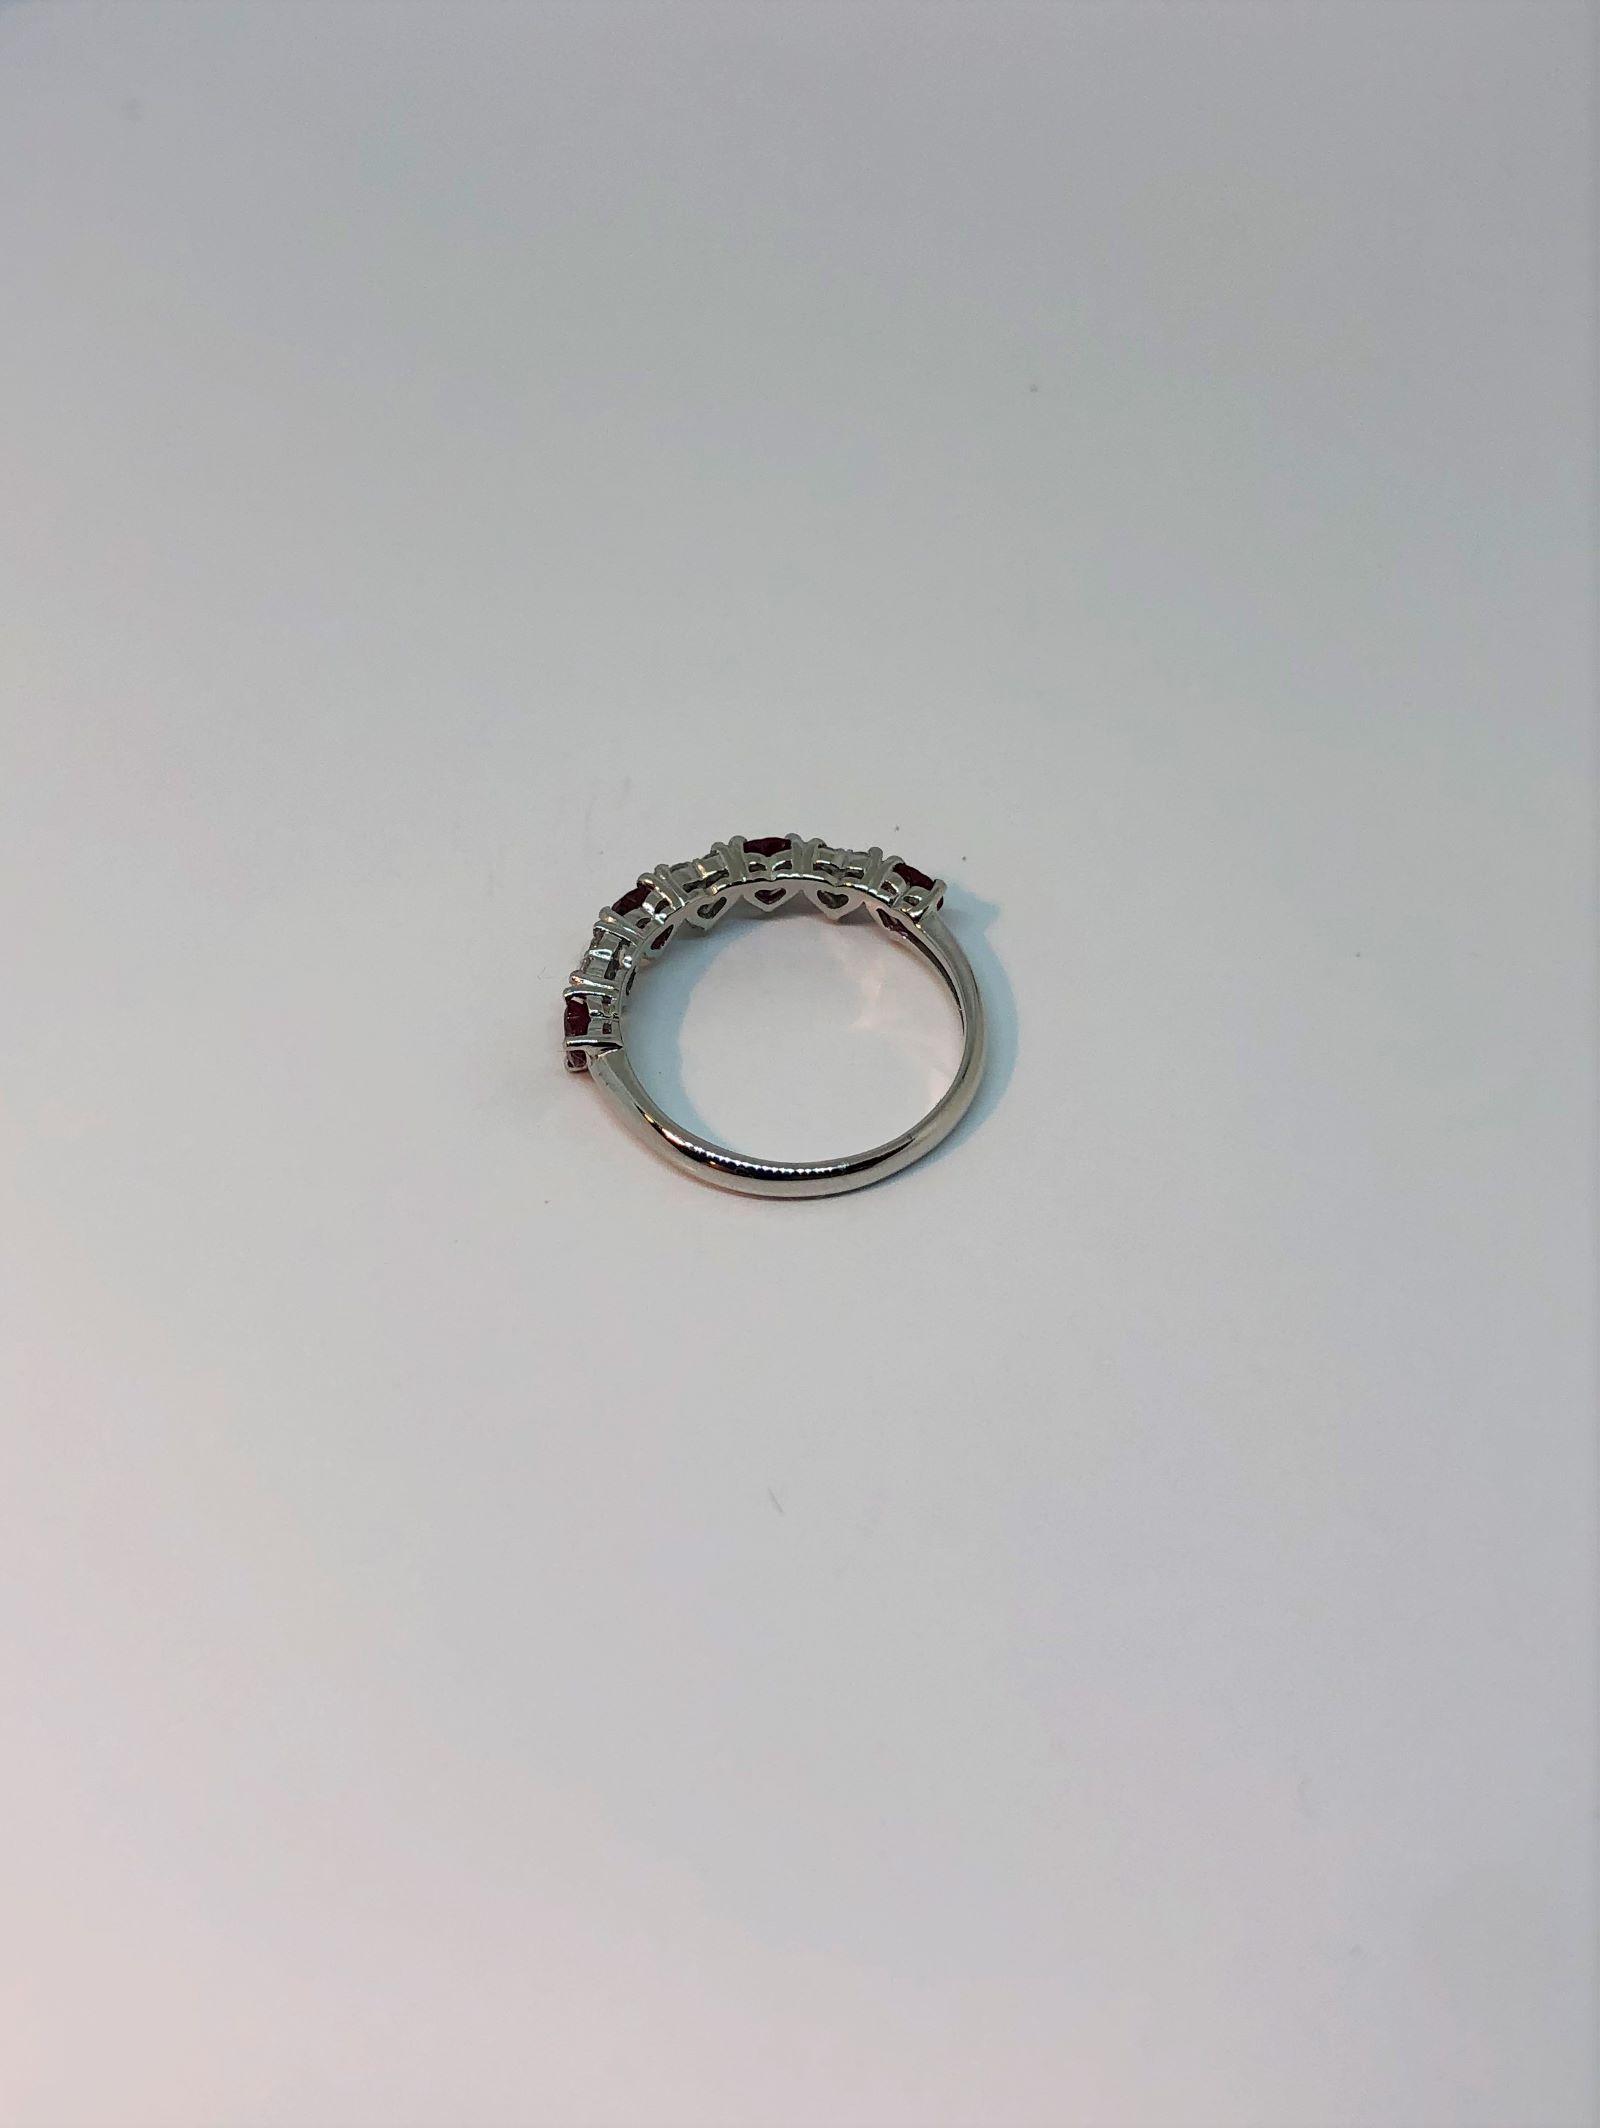 1 Carat Ruby Diamond Ring In White Gold